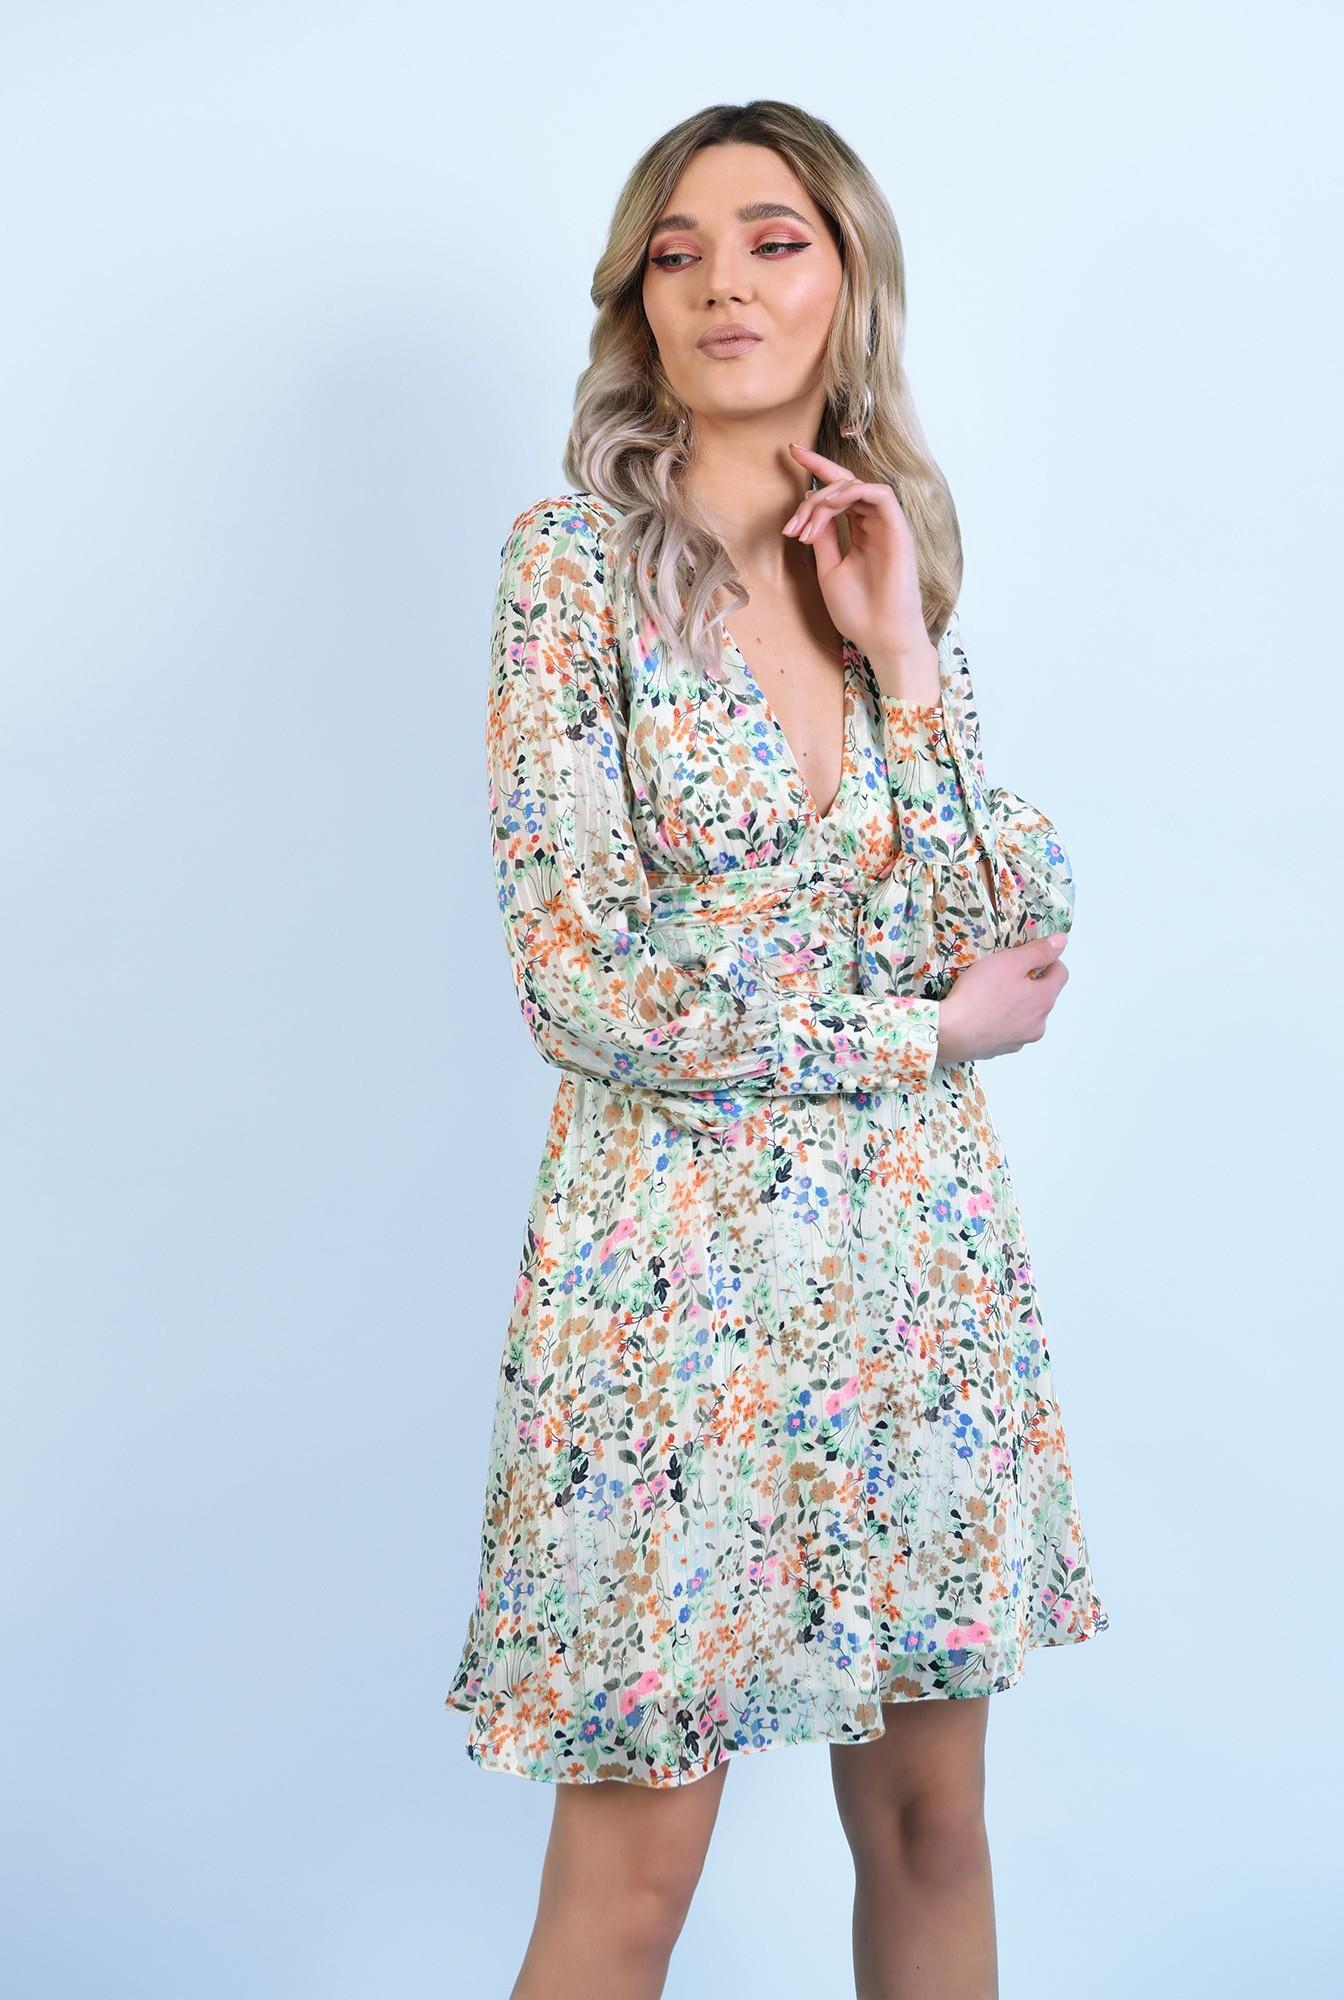 2 - 360 - rochie mini, din sifon, cu flori, maneci lungi, betelie fronsata